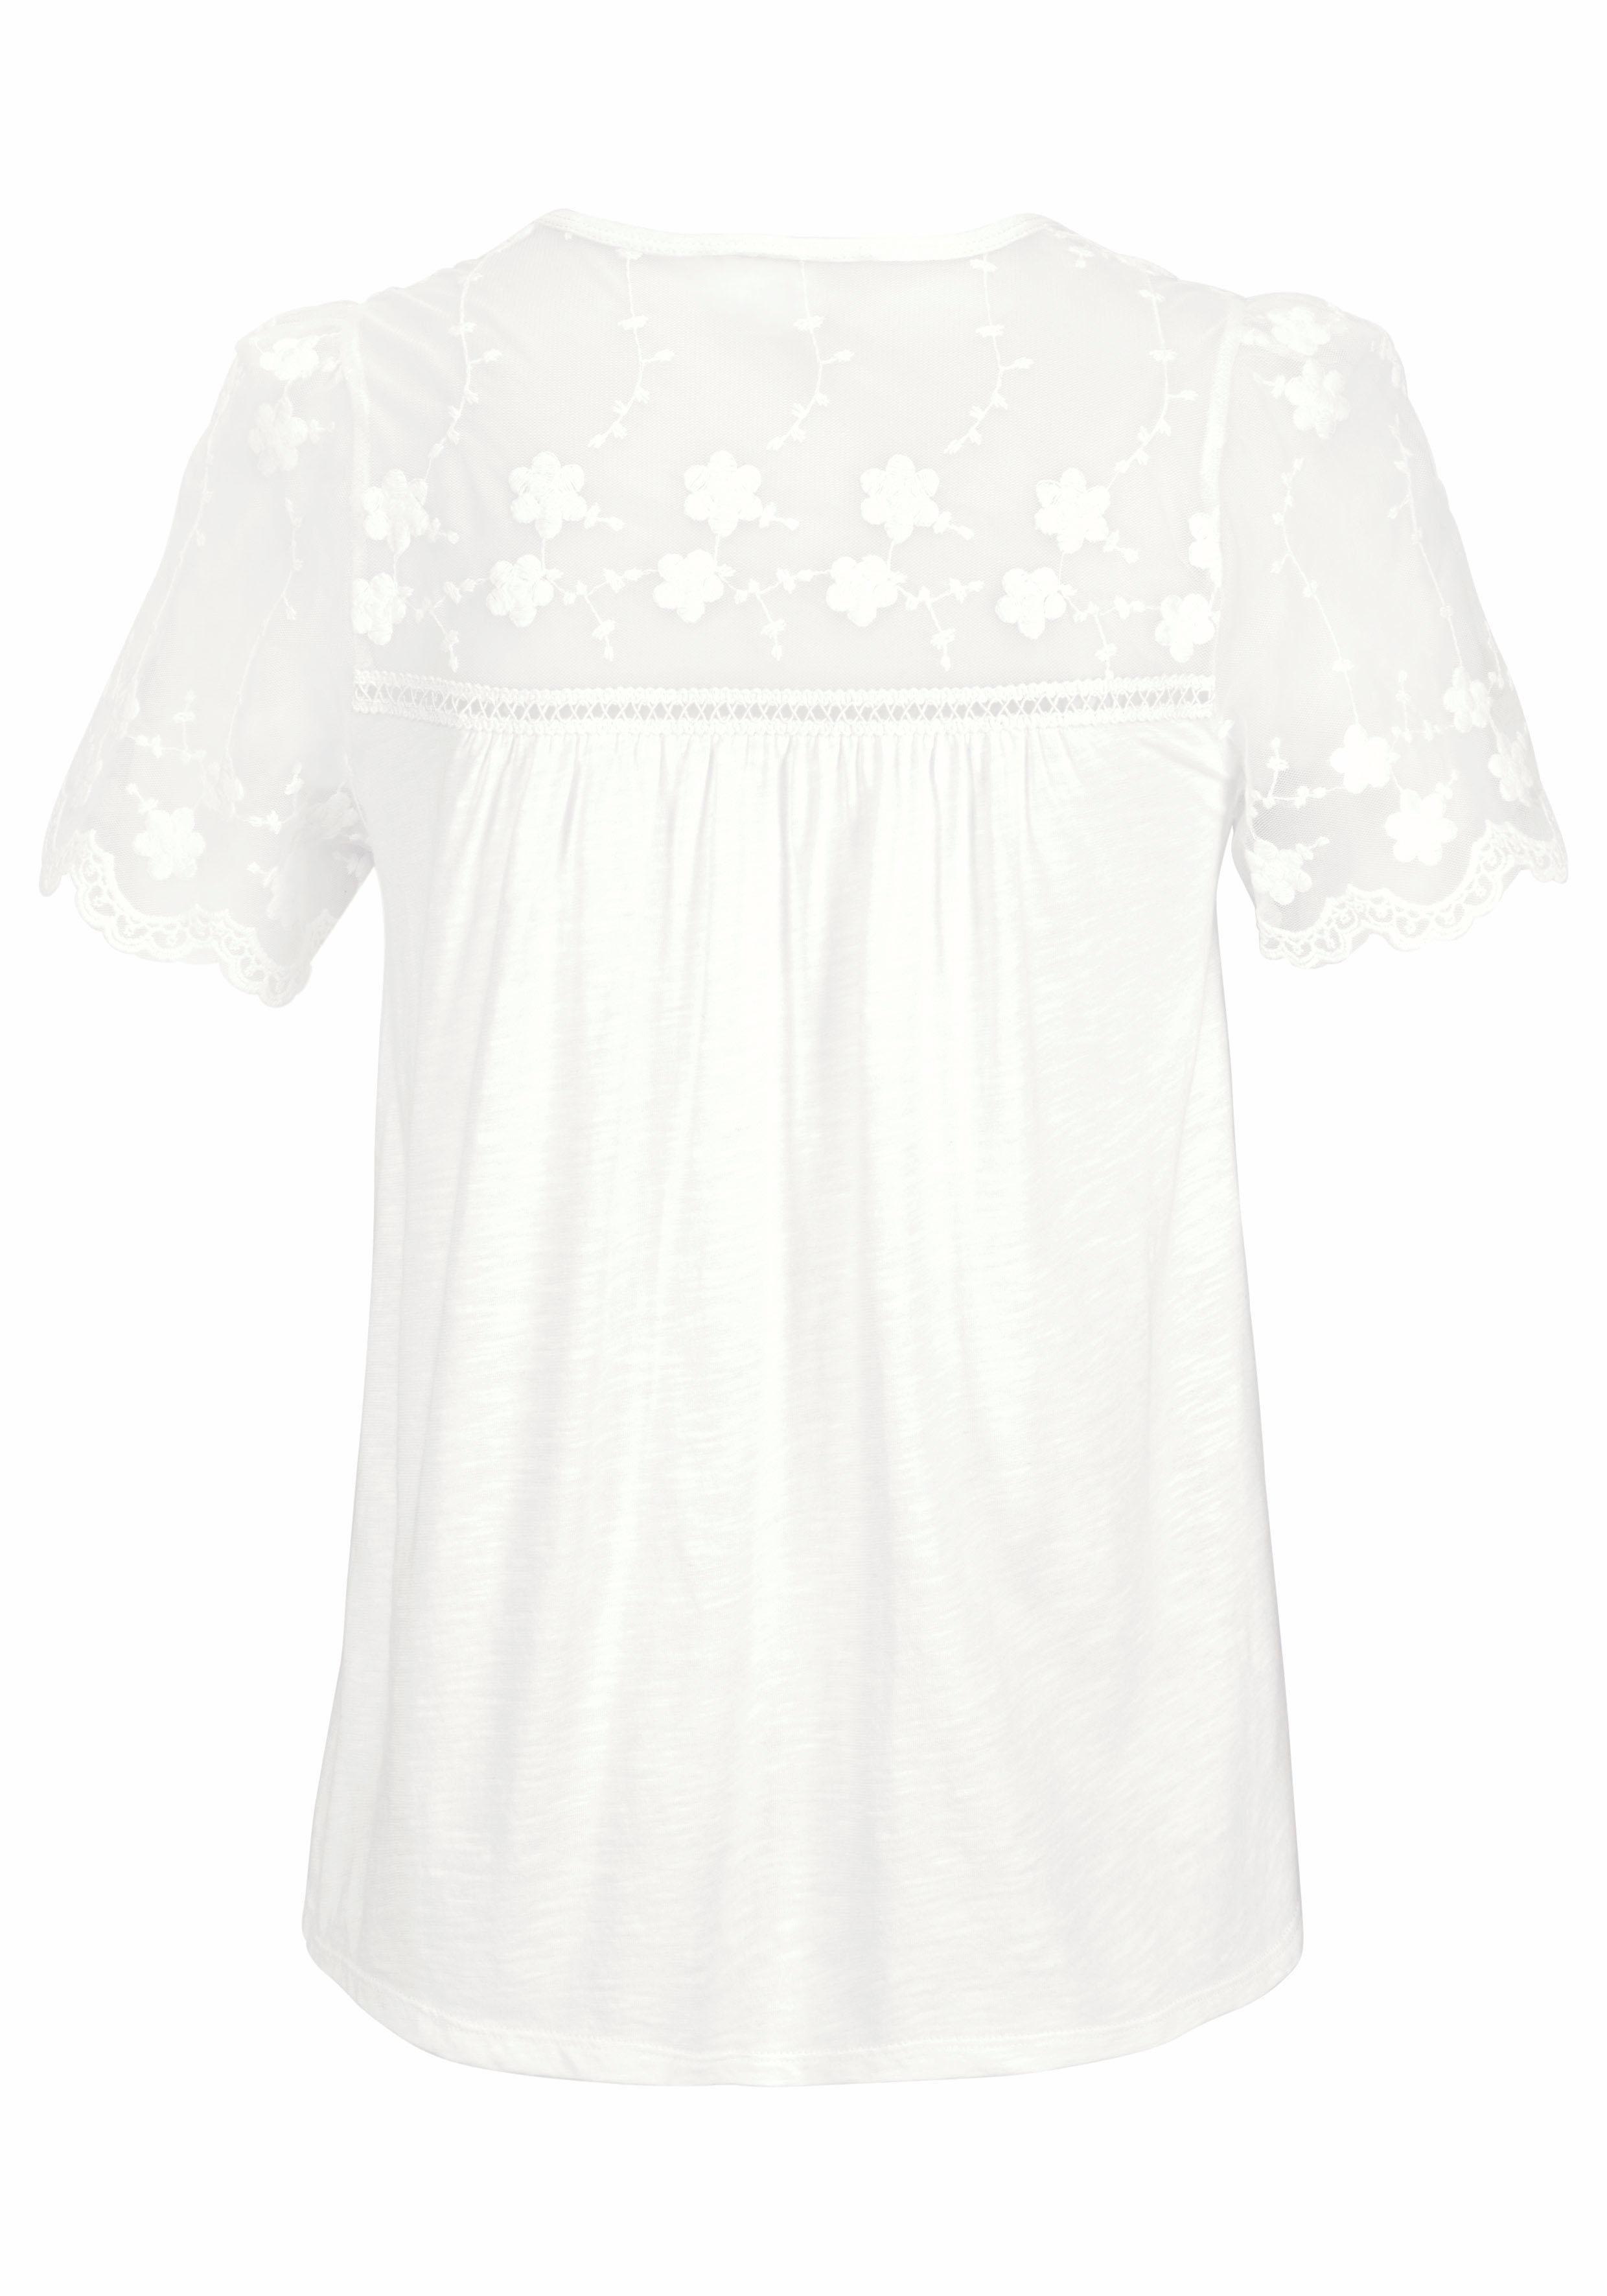 Kaporal Online T T Online shirtlove Shop Kaporal shirtlove 8n0POwkX